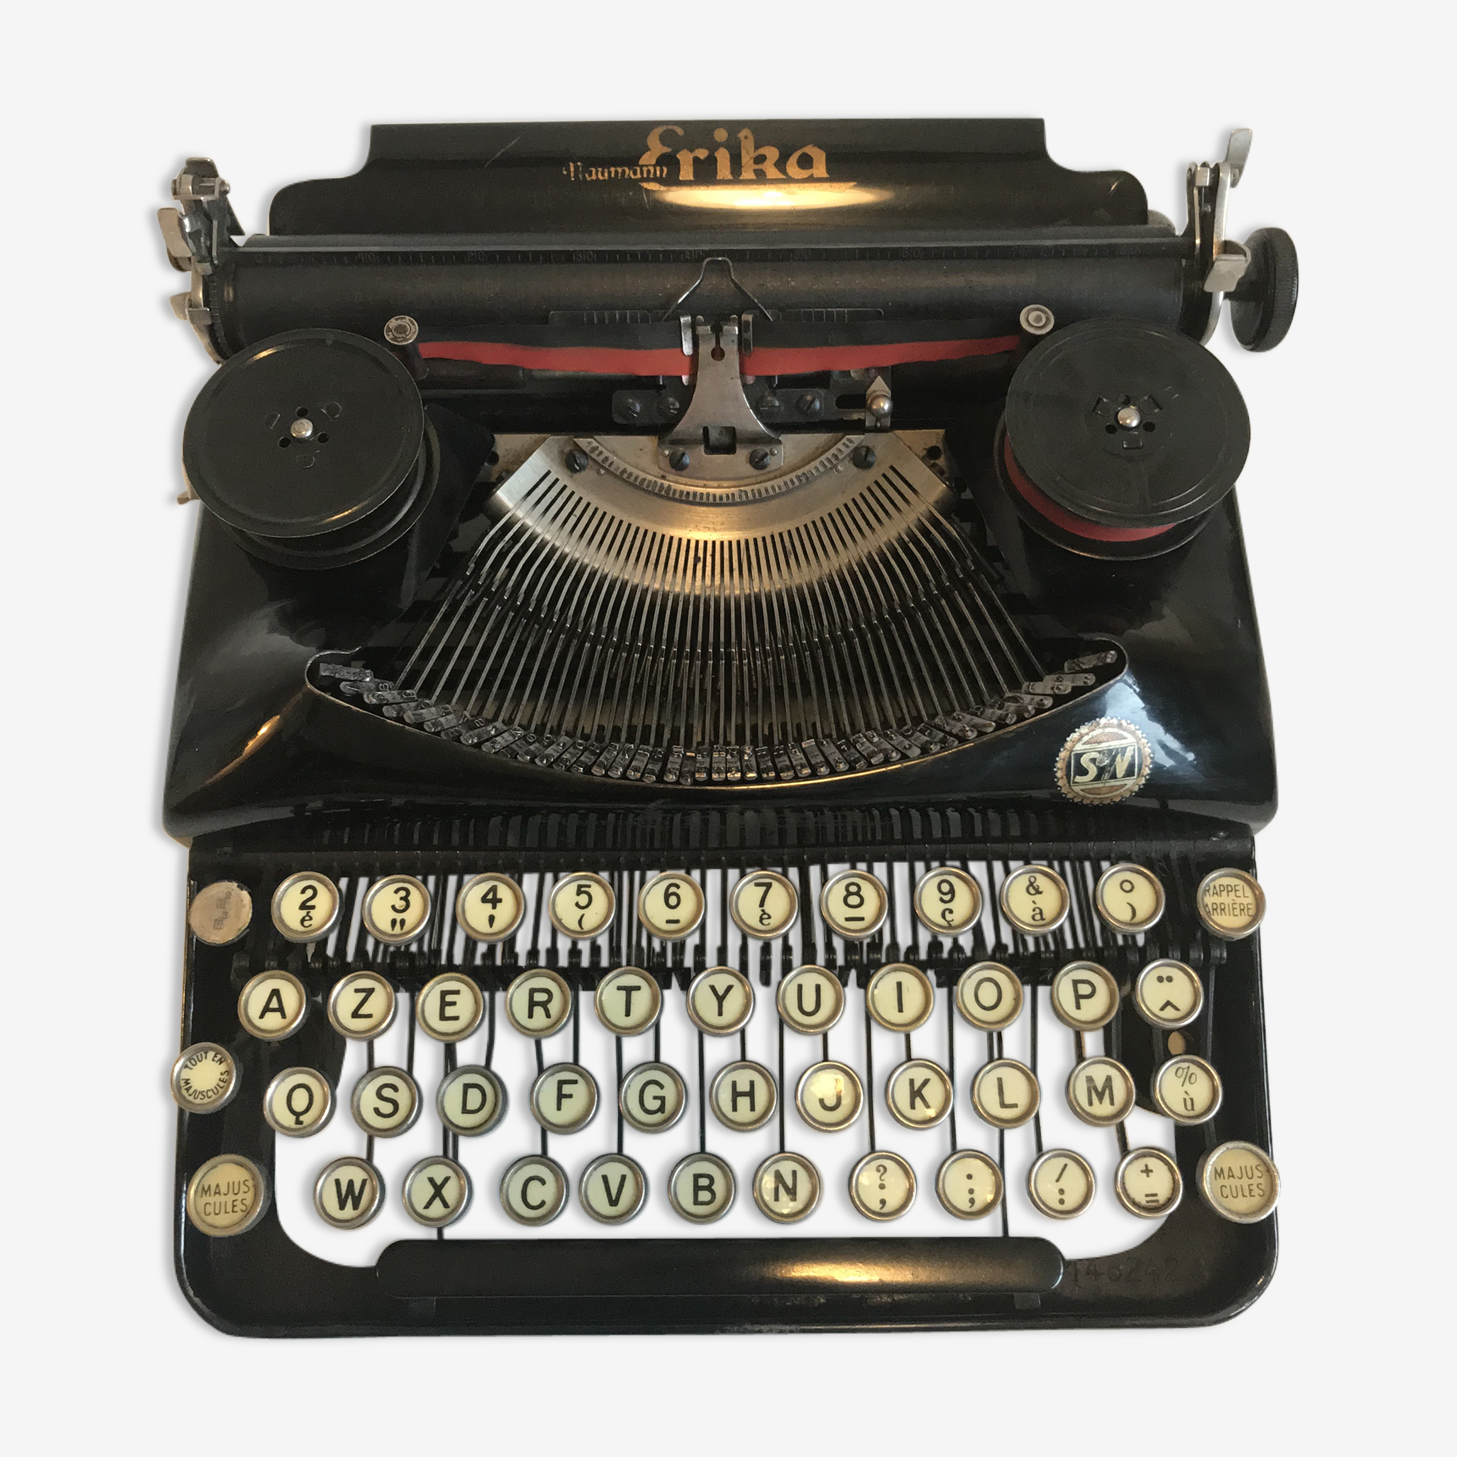 Machine à écrire Erika Naumann